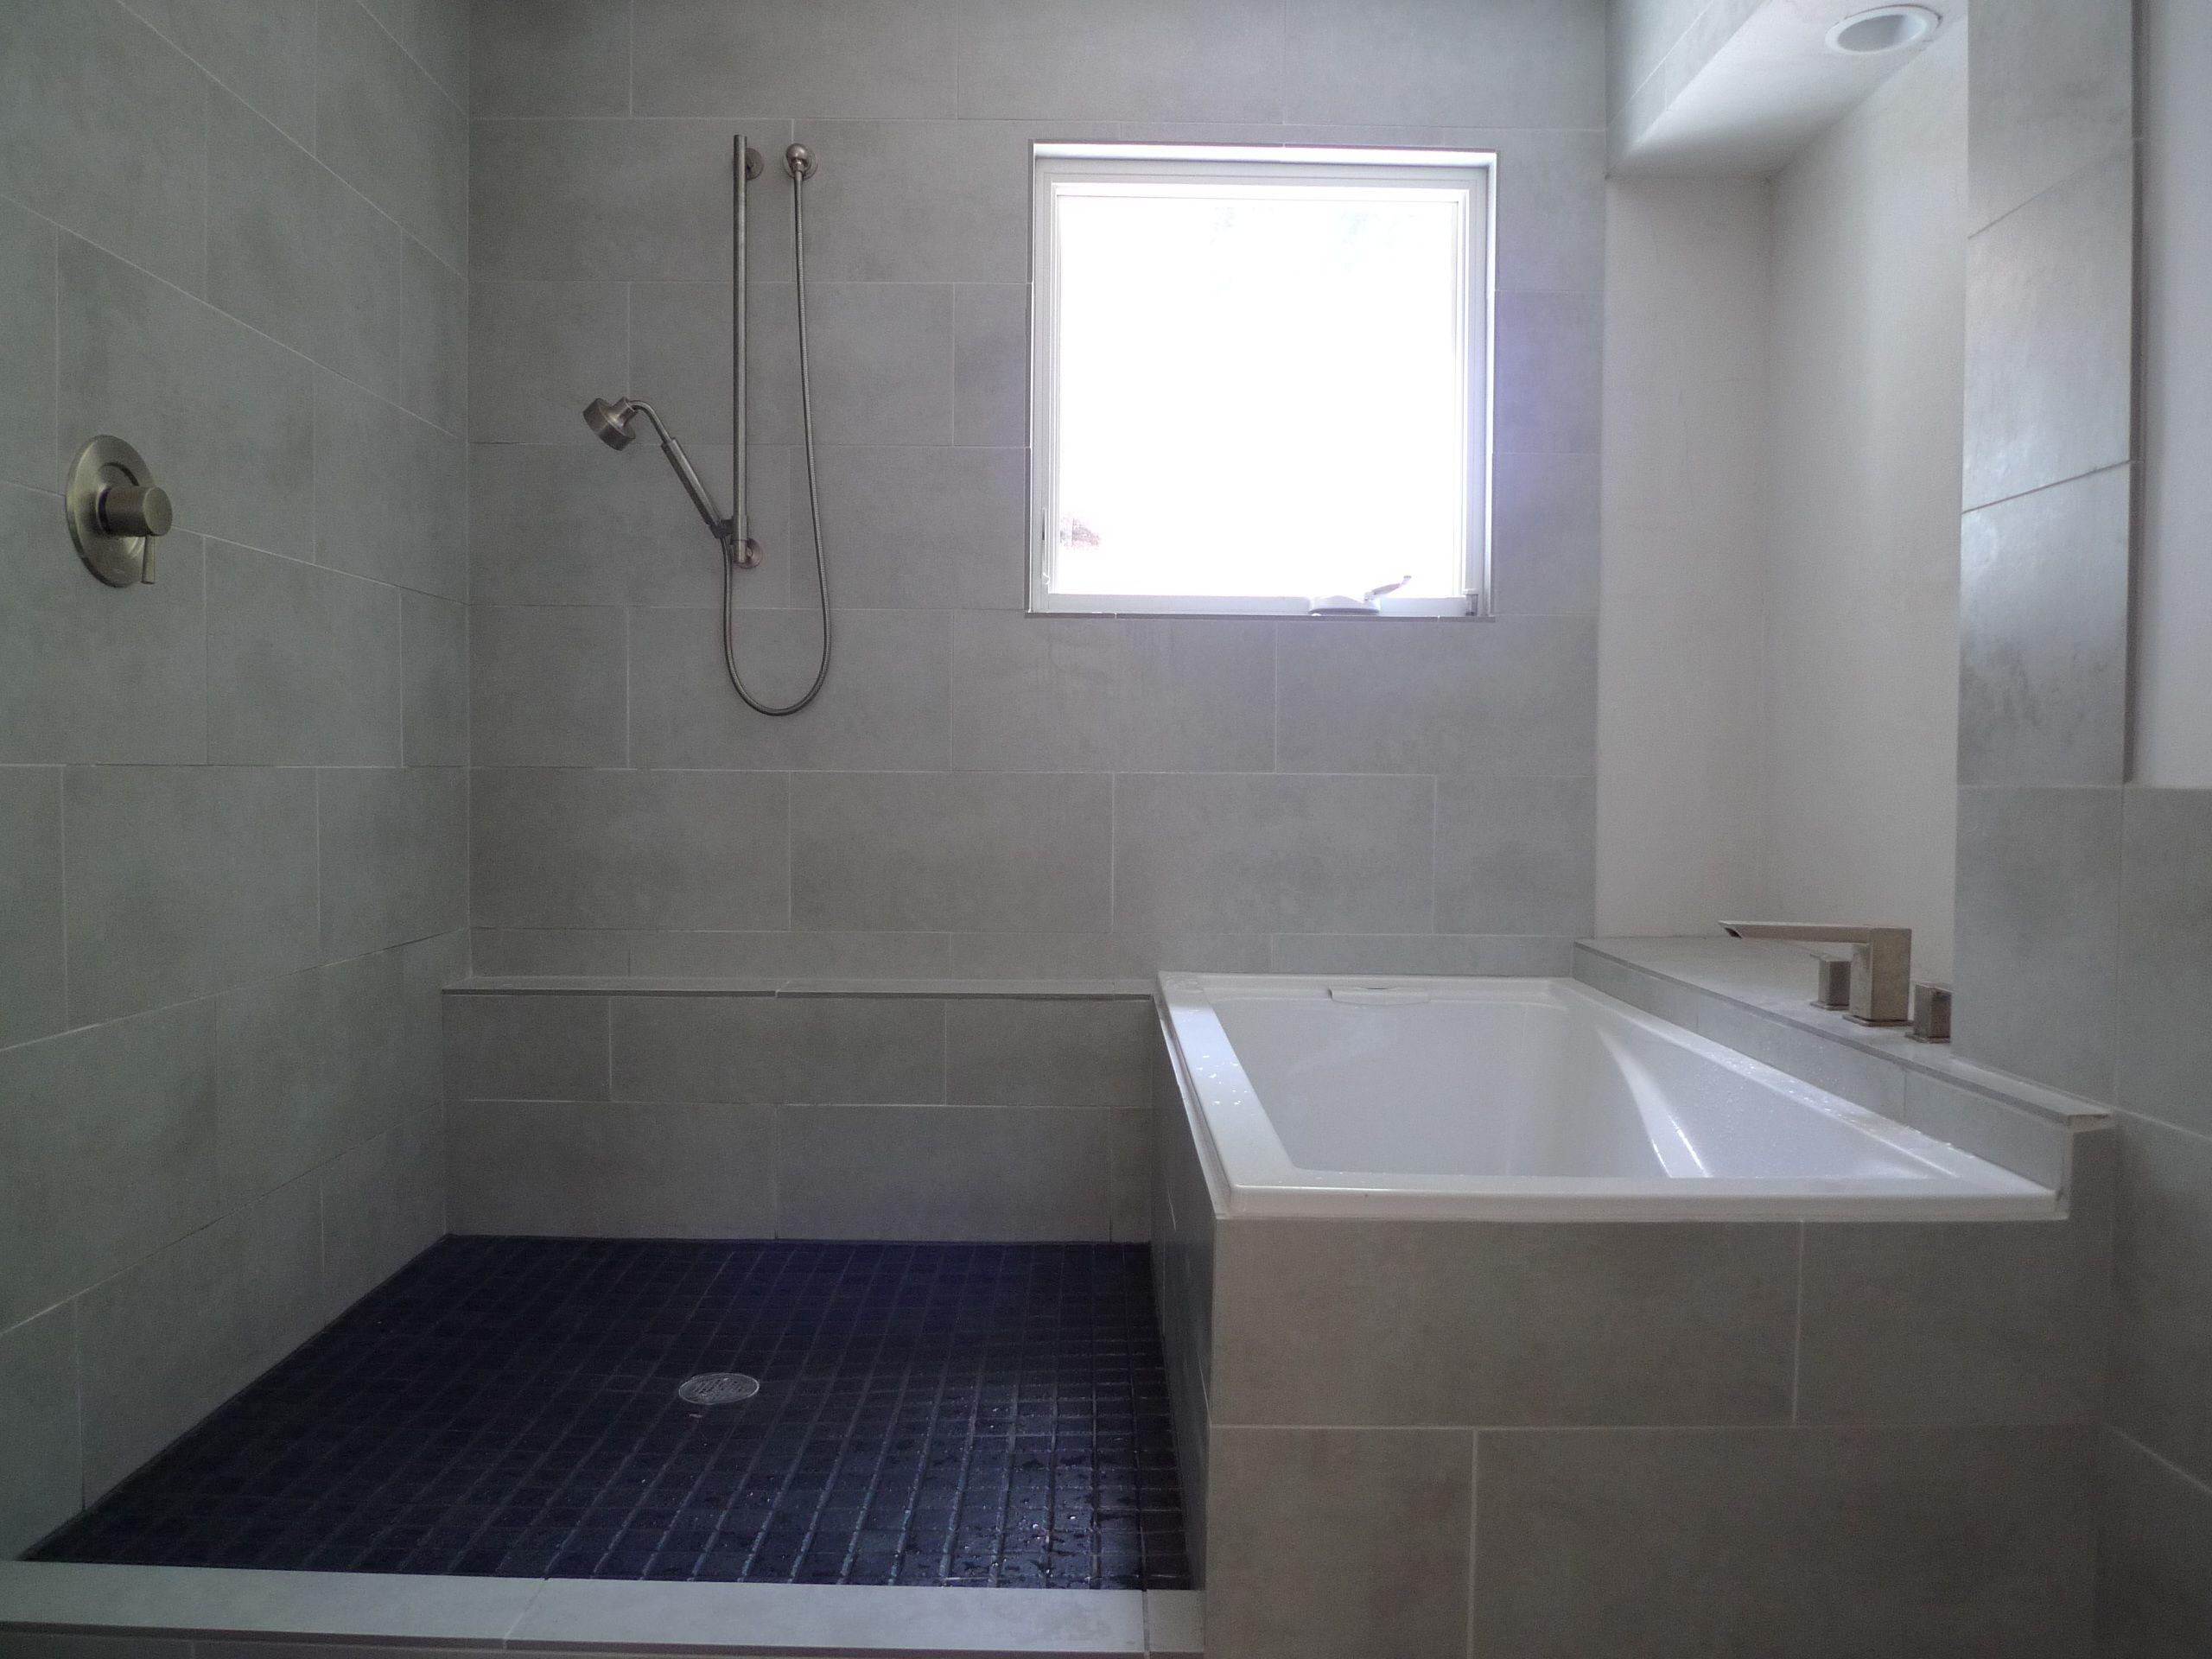 CONCRETE LOOK TILE FOR MODERN BATHROOM ?